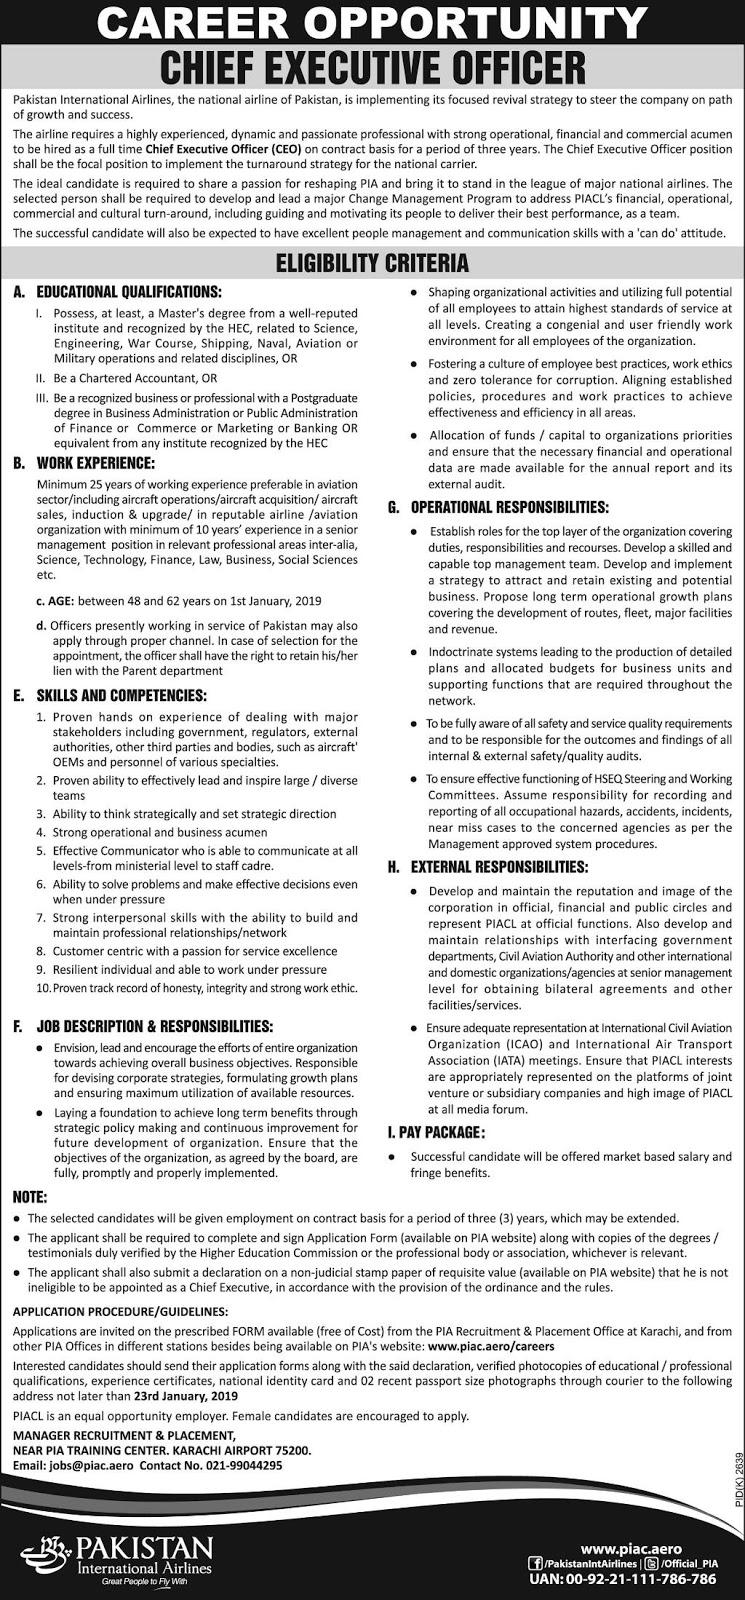 Jobs Vacancies In Pakistan International Airlines PIA 10 January 2019